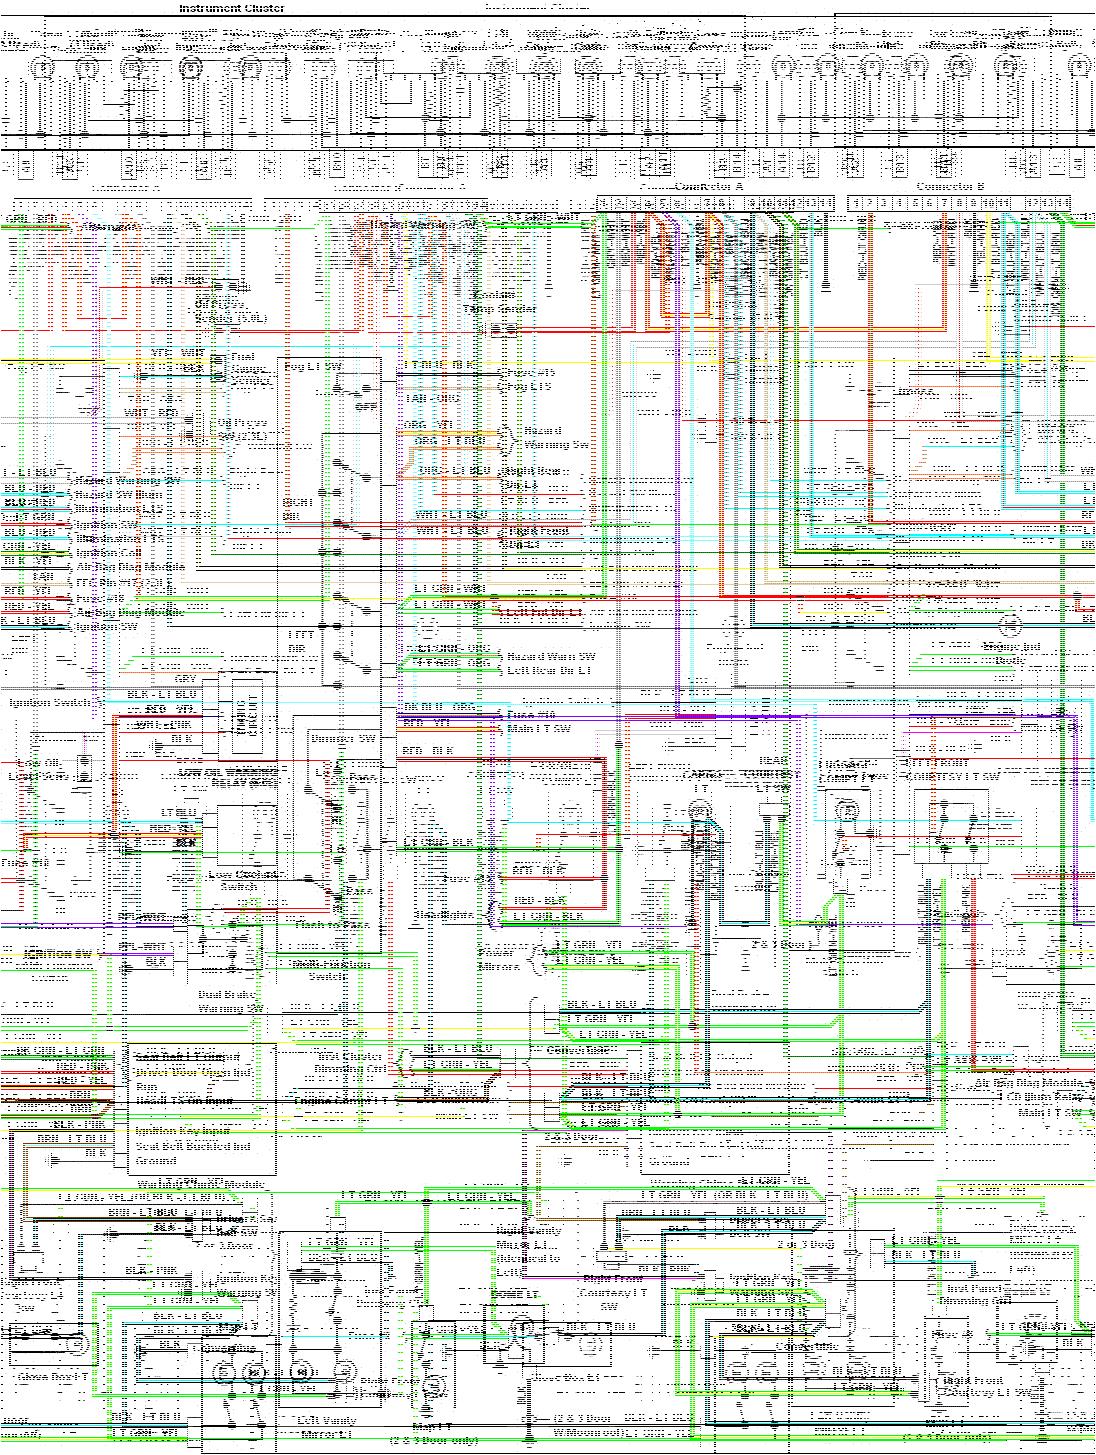 79 ford mustang wiring diagram wiring diagrams konsult 79 mustang wiring diagram 79 mustang wiring diagram